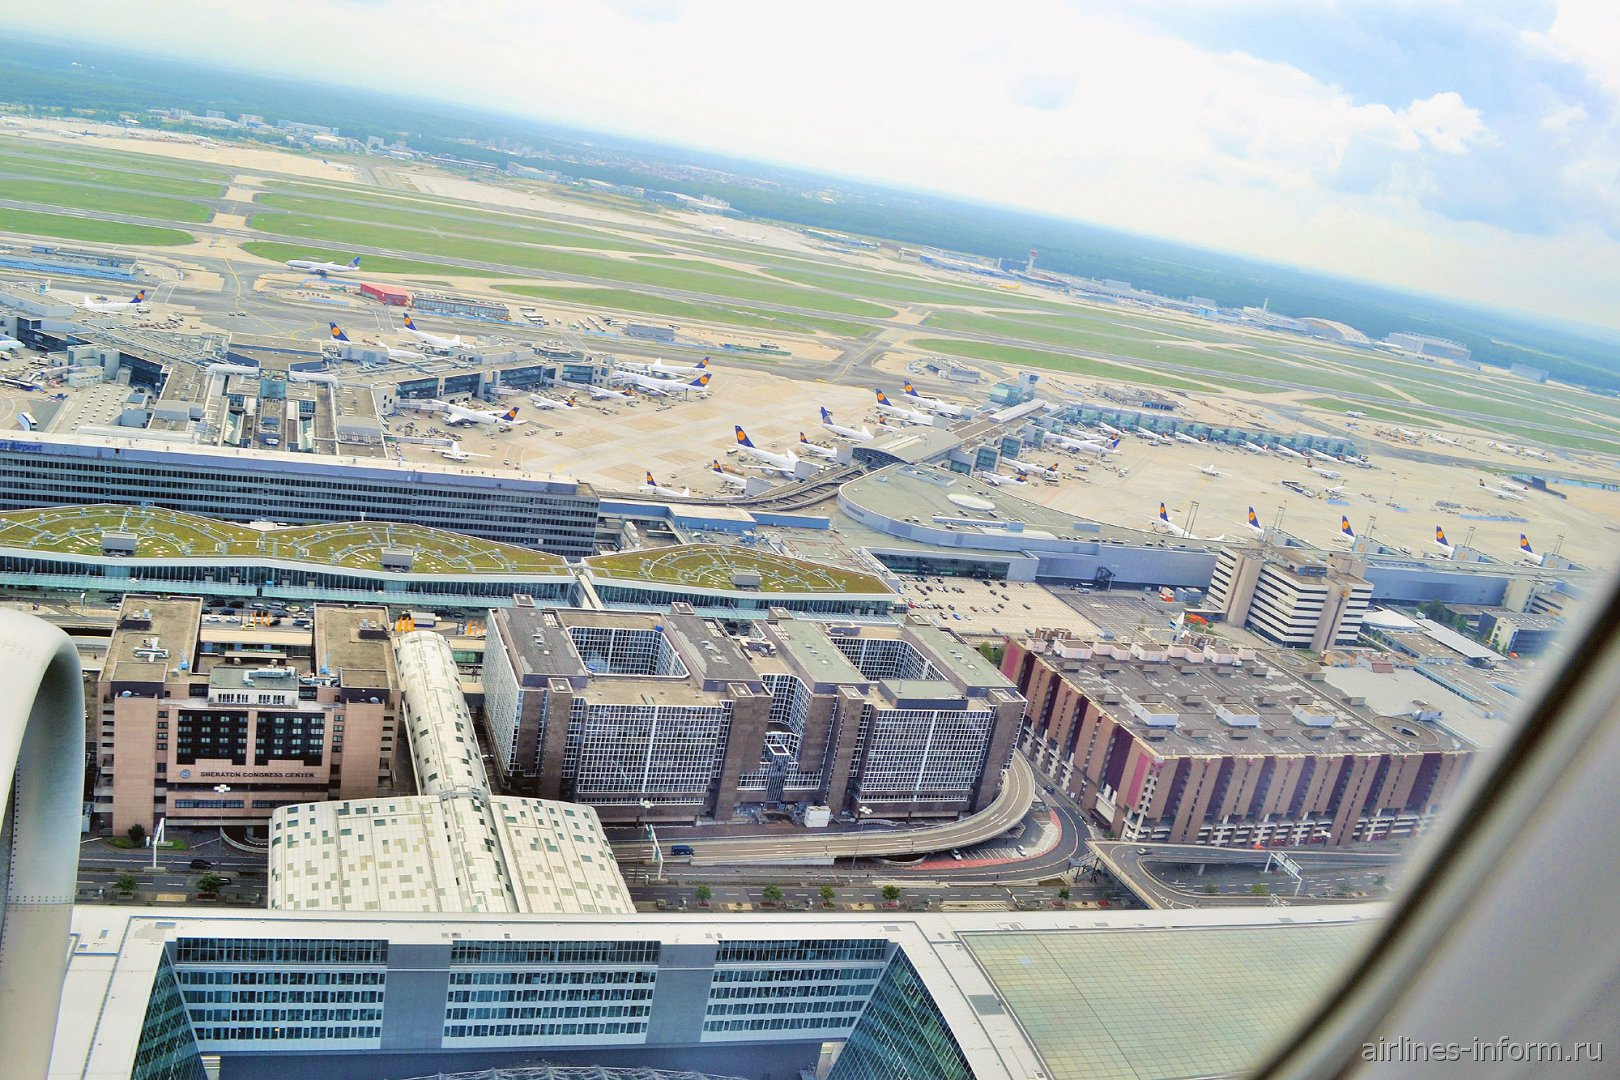 Терминал 1 аэропорта Франкфурт